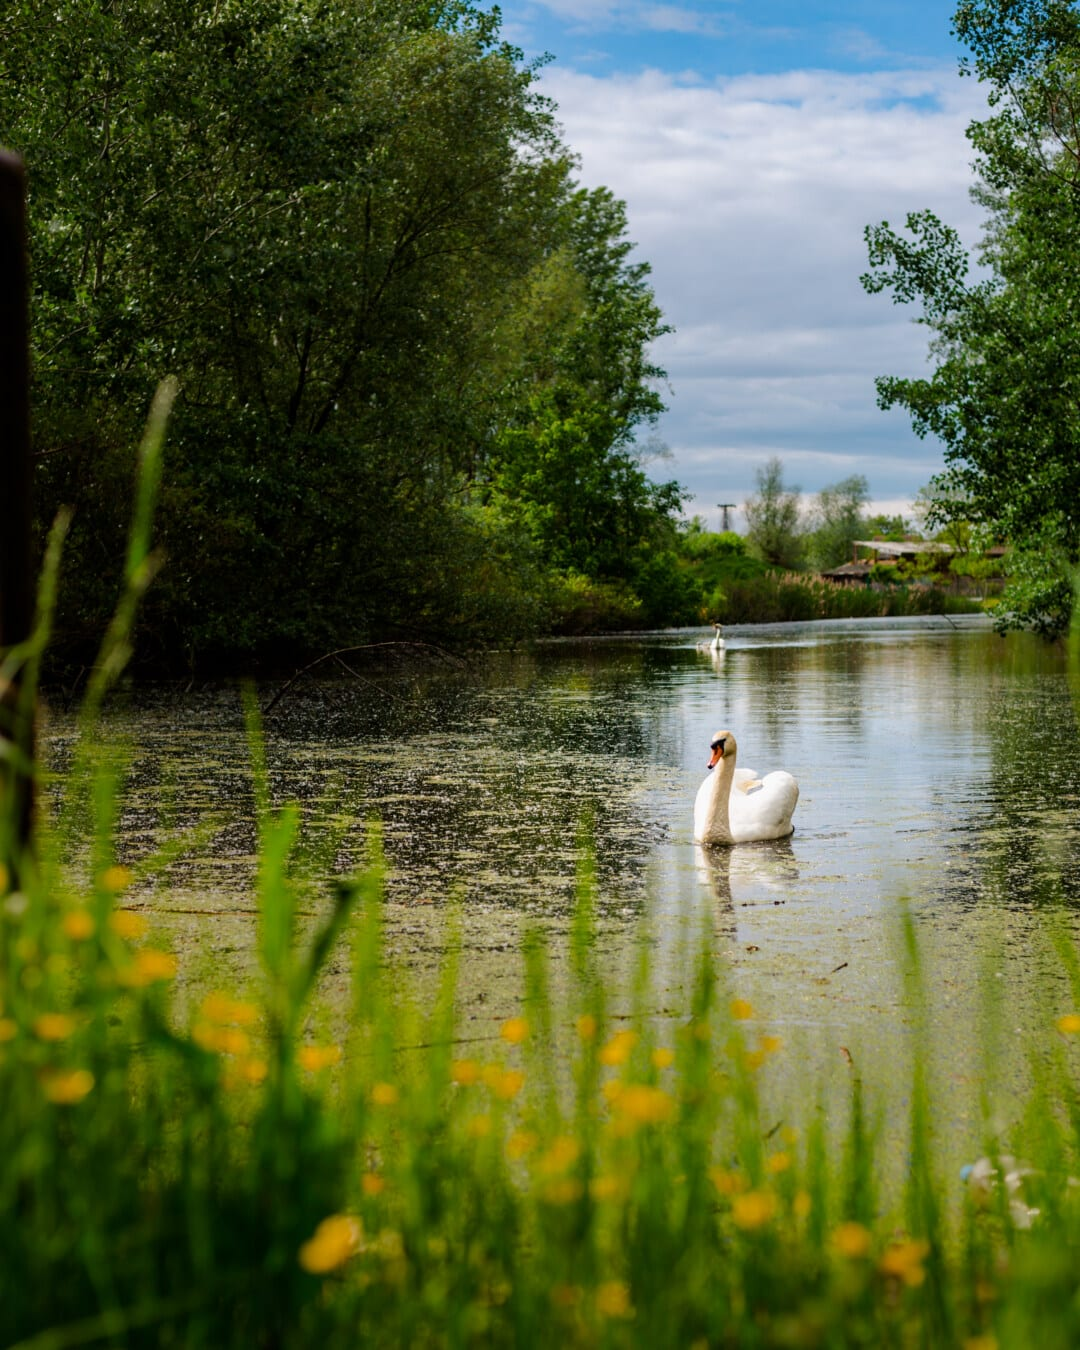 swamp, swan, wetland, water, tree, landscape, reflection, lake, pool, nature